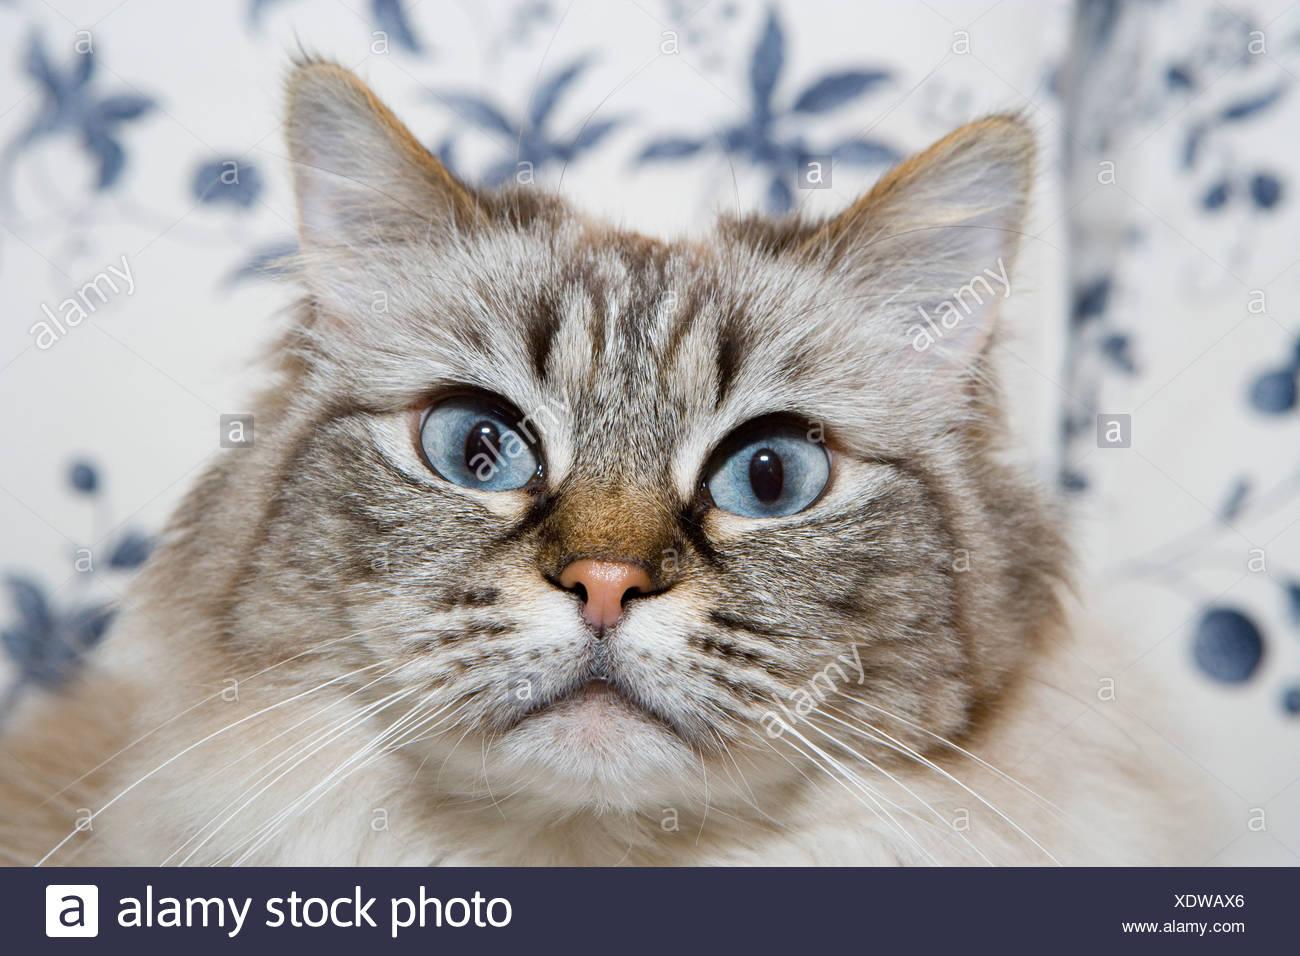 portrait of blue eyed cat - Stock Image